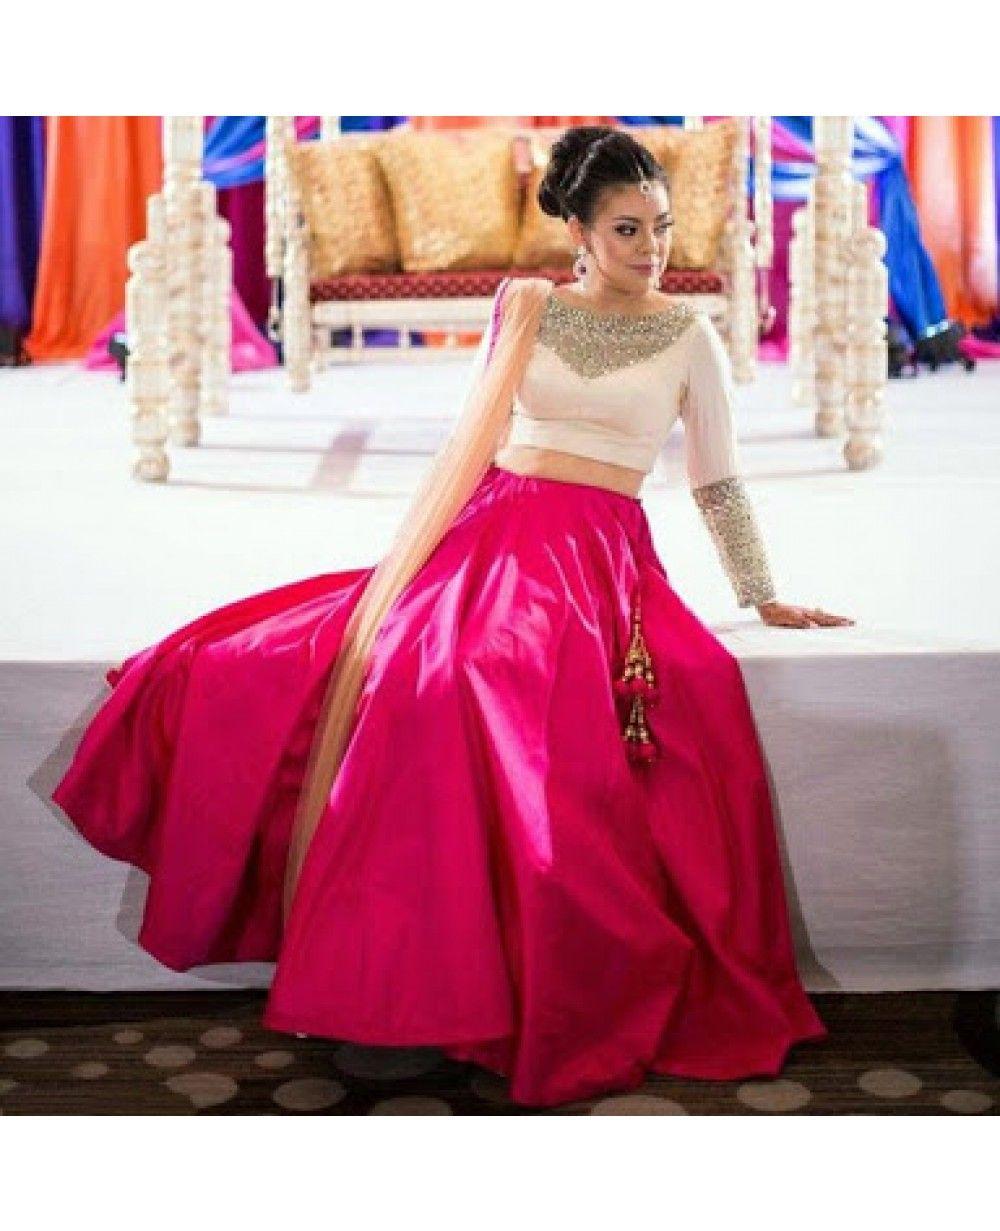 Other Women's Clothing Women's Clothing Frank Indian Bollywood Replica Lehenga Skirt Choli Indian Women Designer Lengha Choli